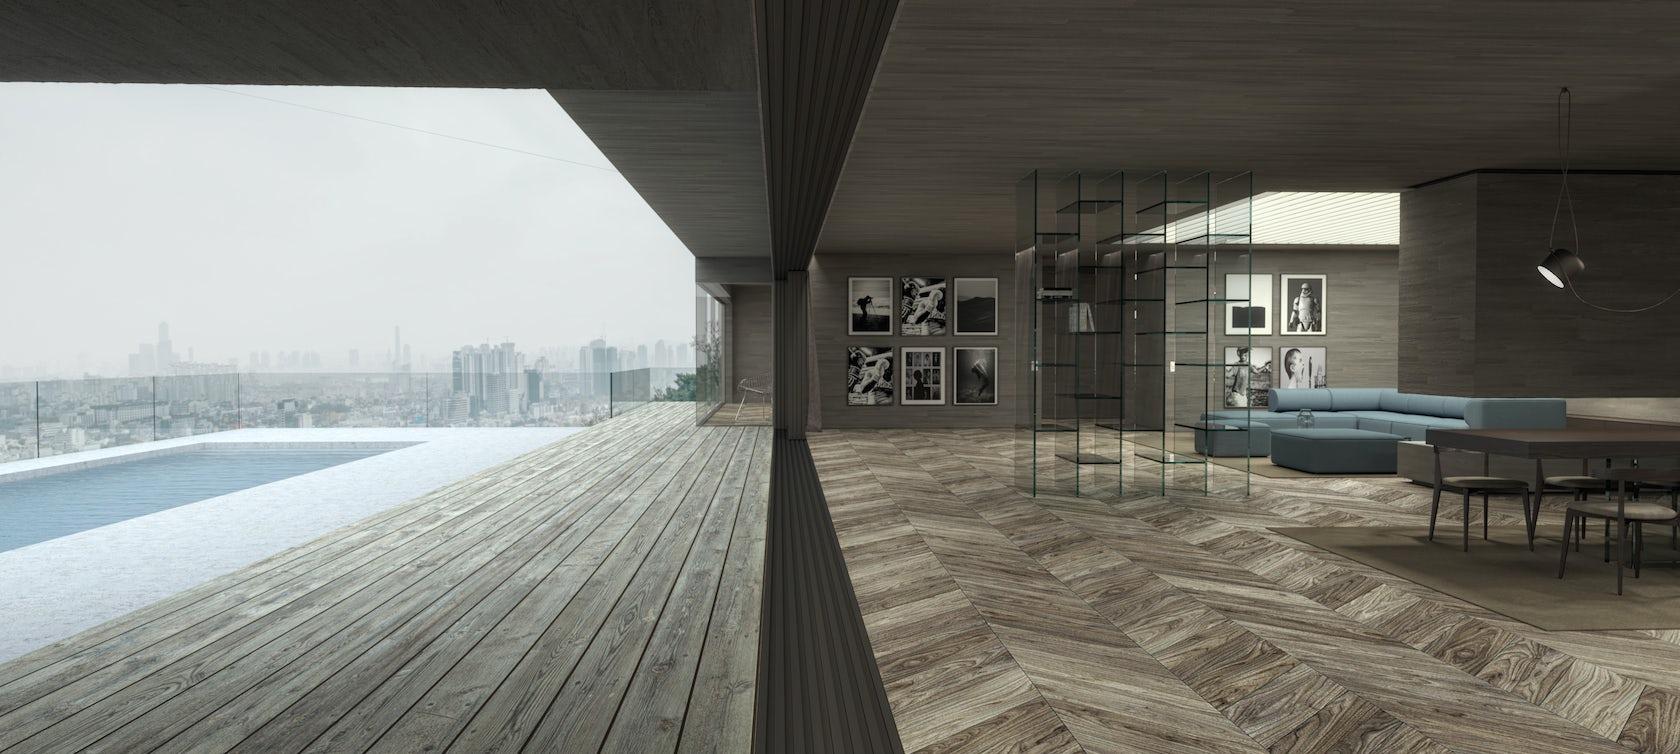 Schuster innenausbau architizer for Innenarchitektur studium new york